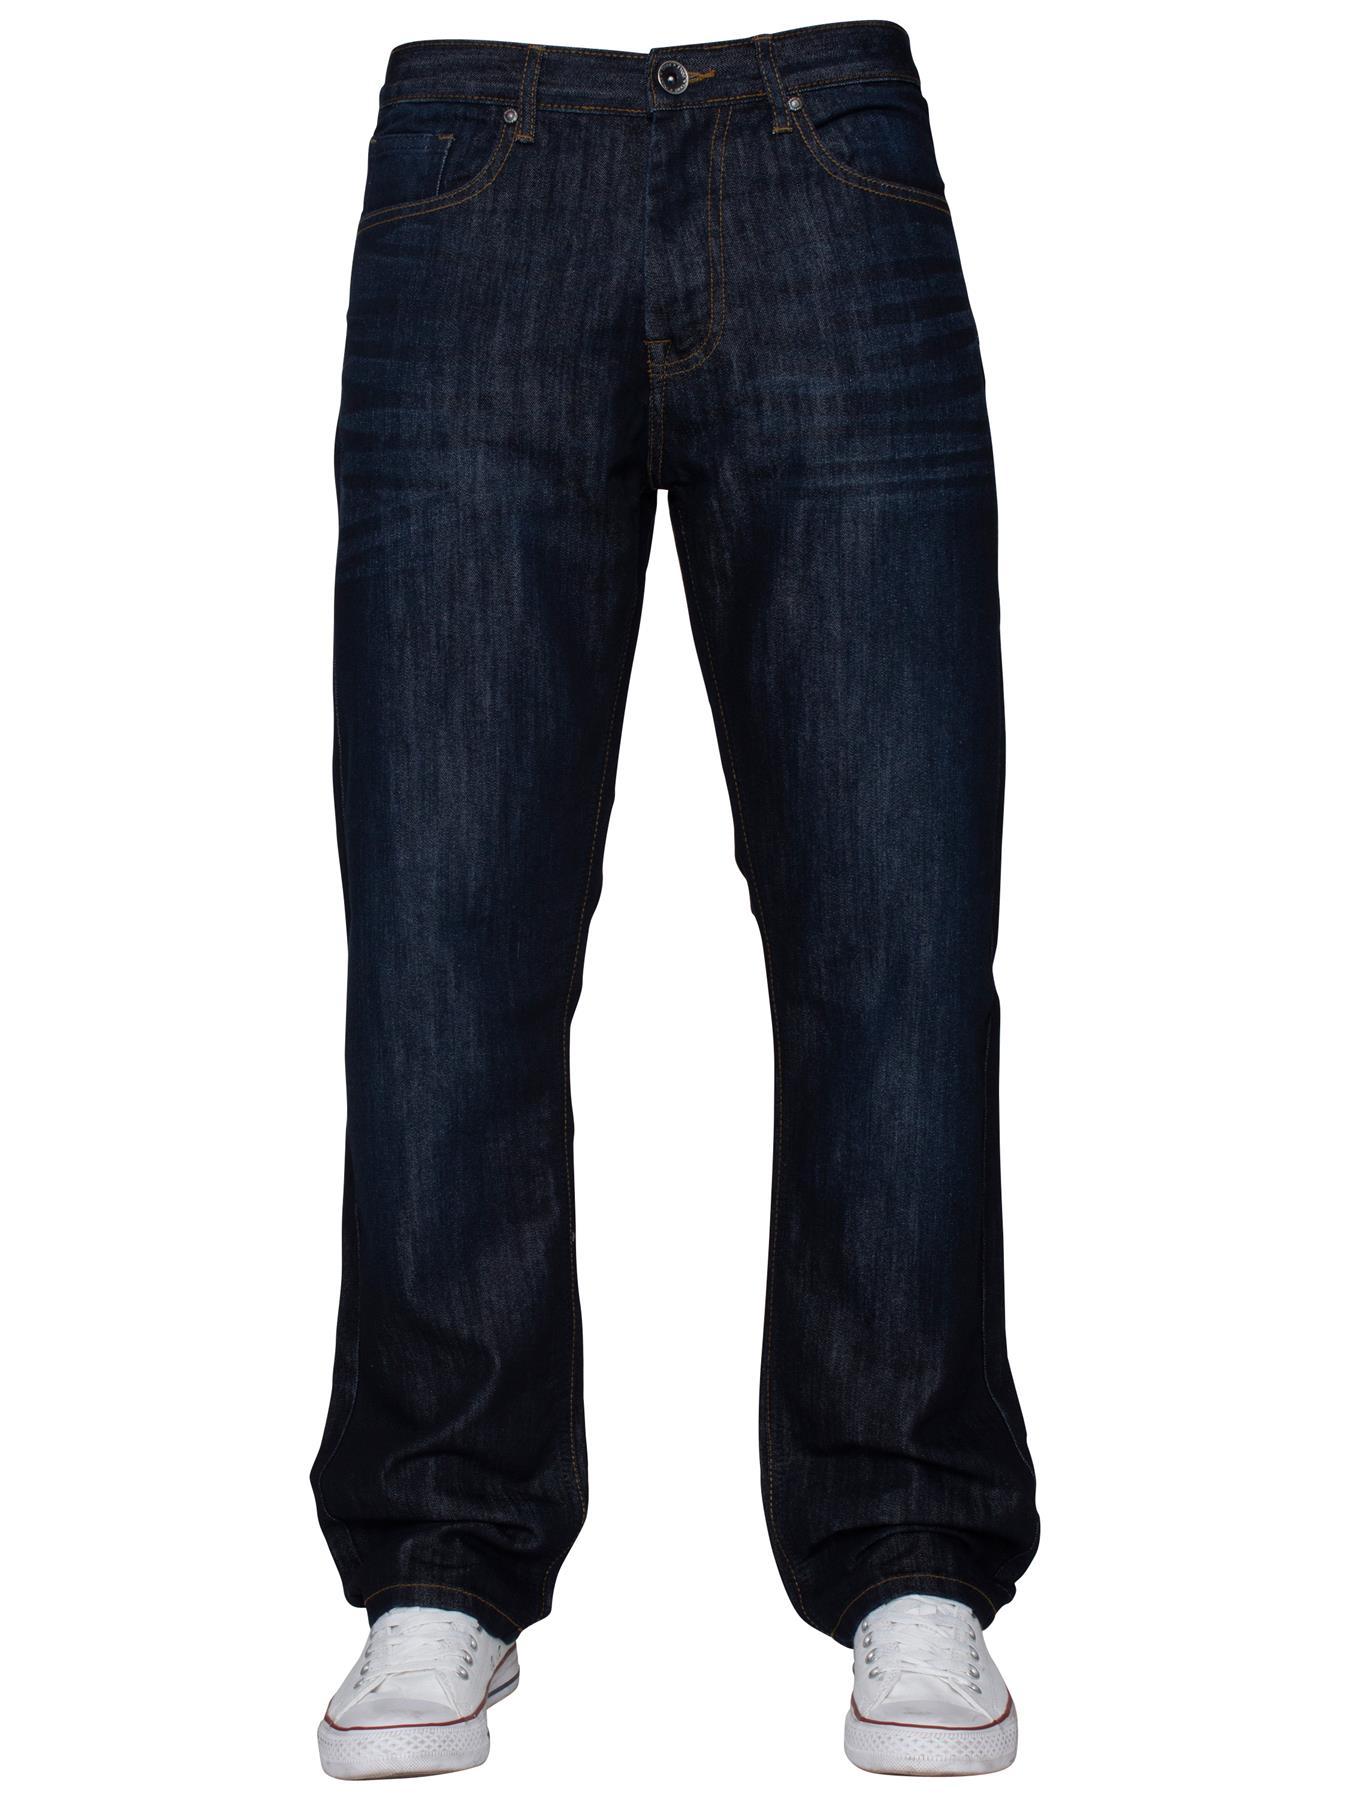 Mens-Regular-Fit-Jeans-Straight-Leg-Denim-Pants-Trousers-Pants-All-Waist-Sizes thumbnail 20